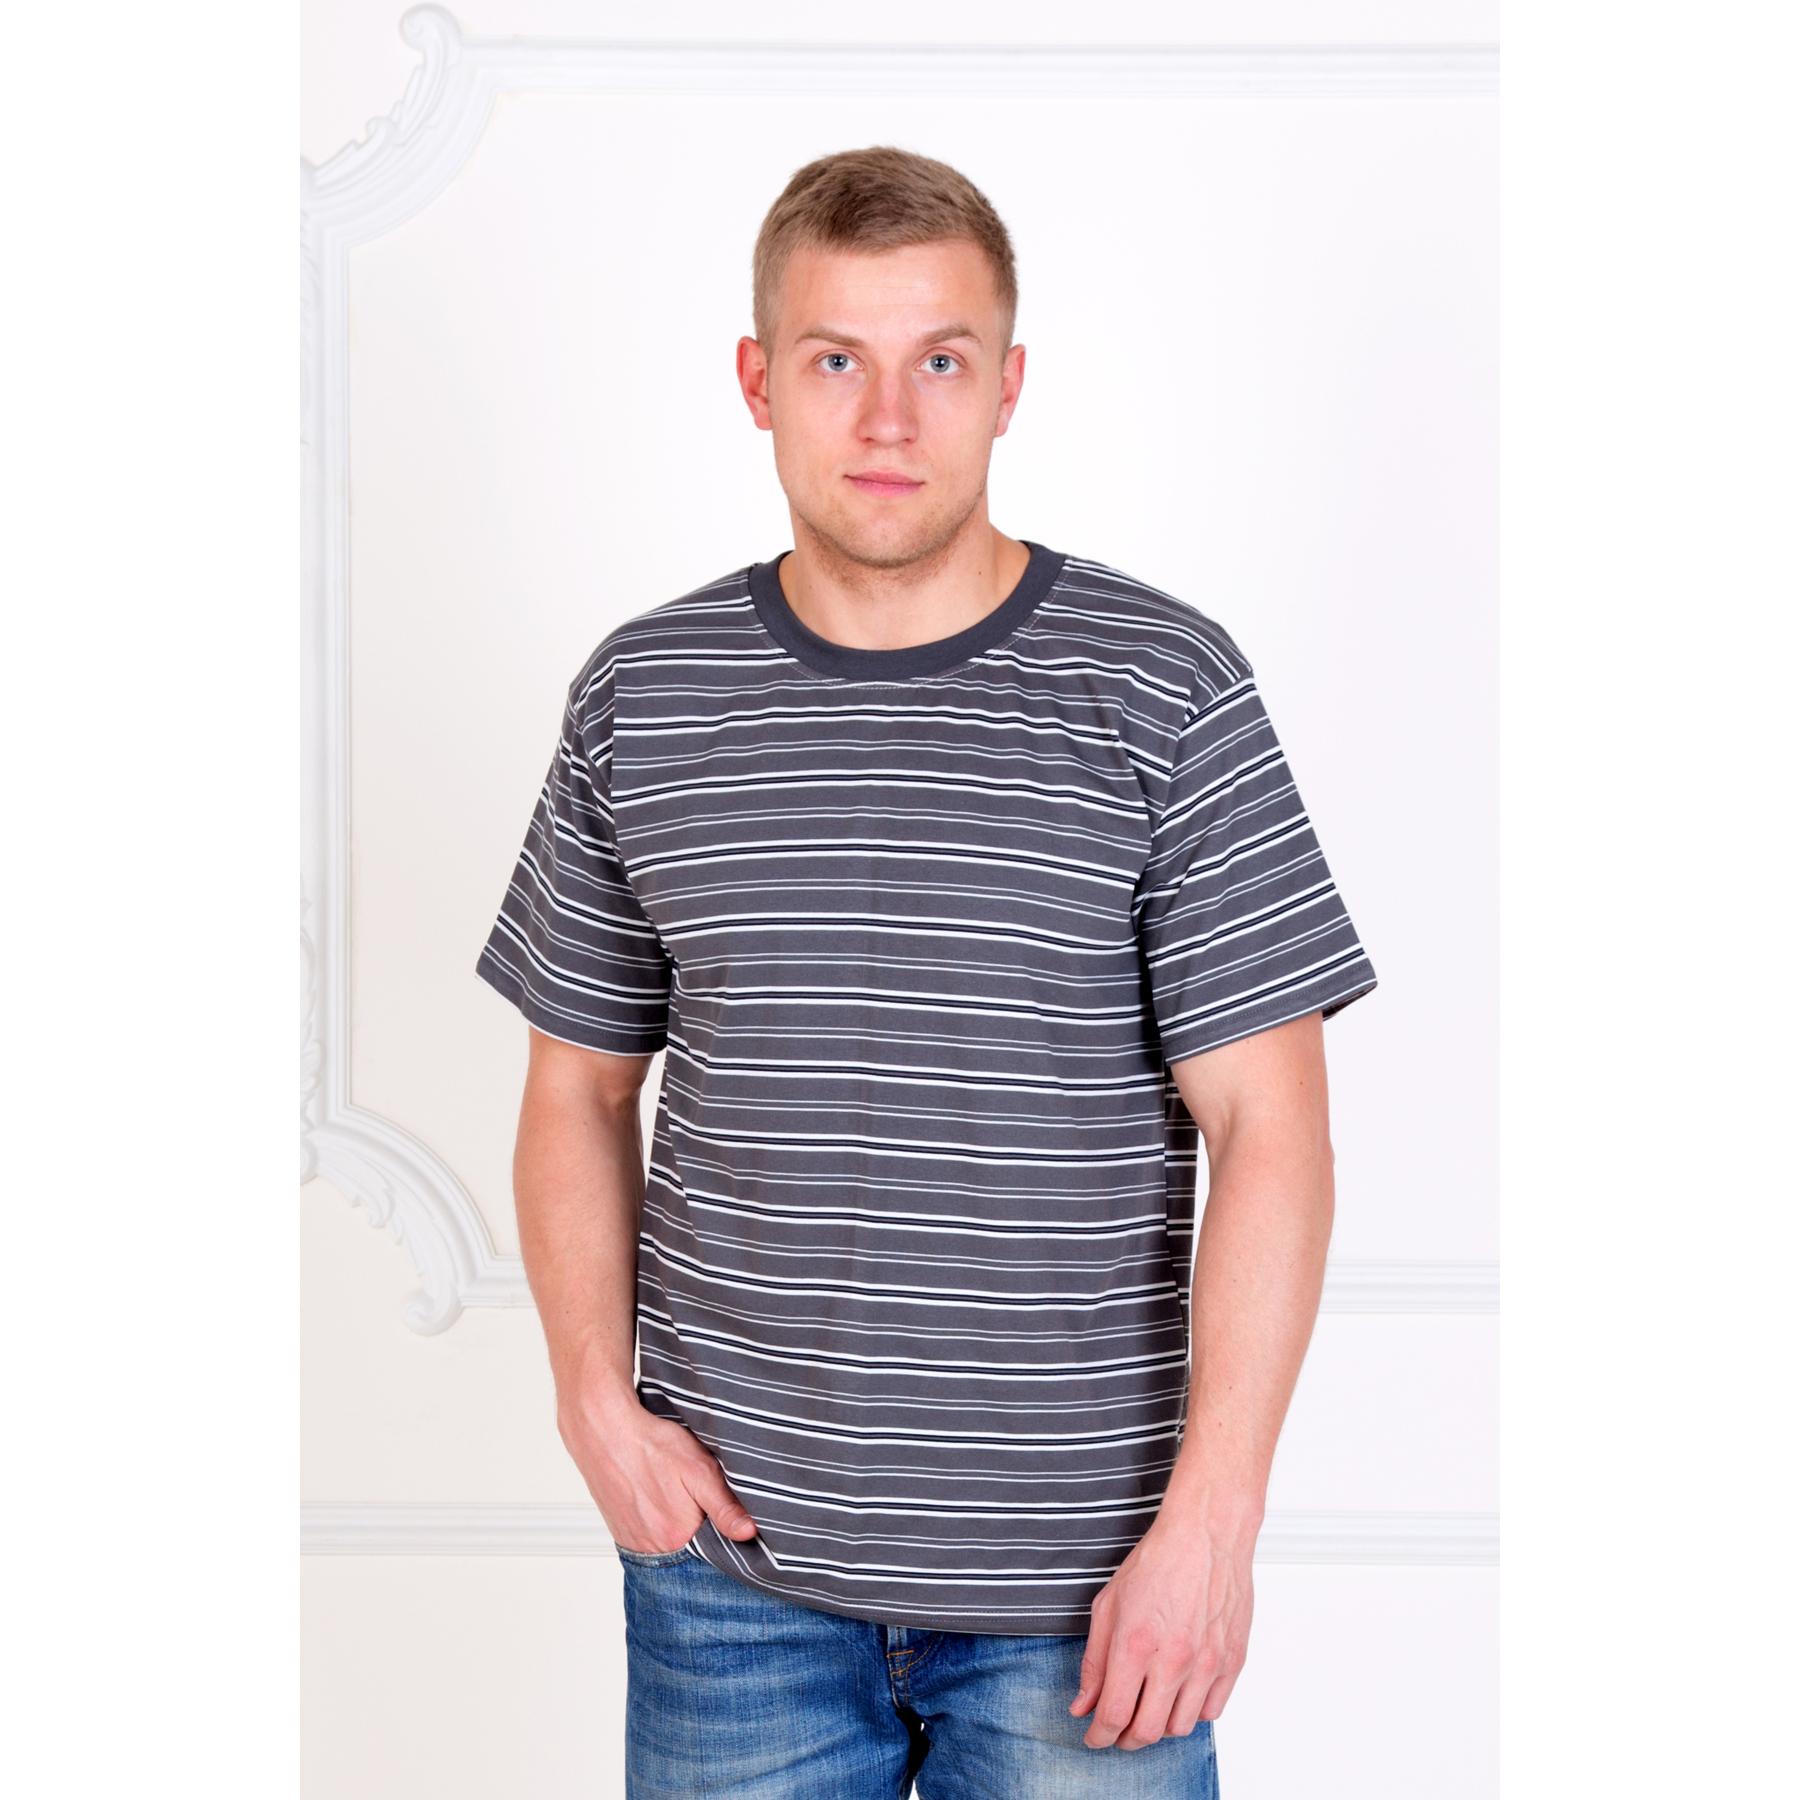 Мужская футболка Полосы Серый, размер 50Футболки и майки<br>Обхват груди:100 см<br>Обхват талии:92 см<br>Обхват бедер:106 см<br>Рост:176-182 см<br><br>Тип: Муж. футболка<br>Размер: 50<br>Материал: Кулирка